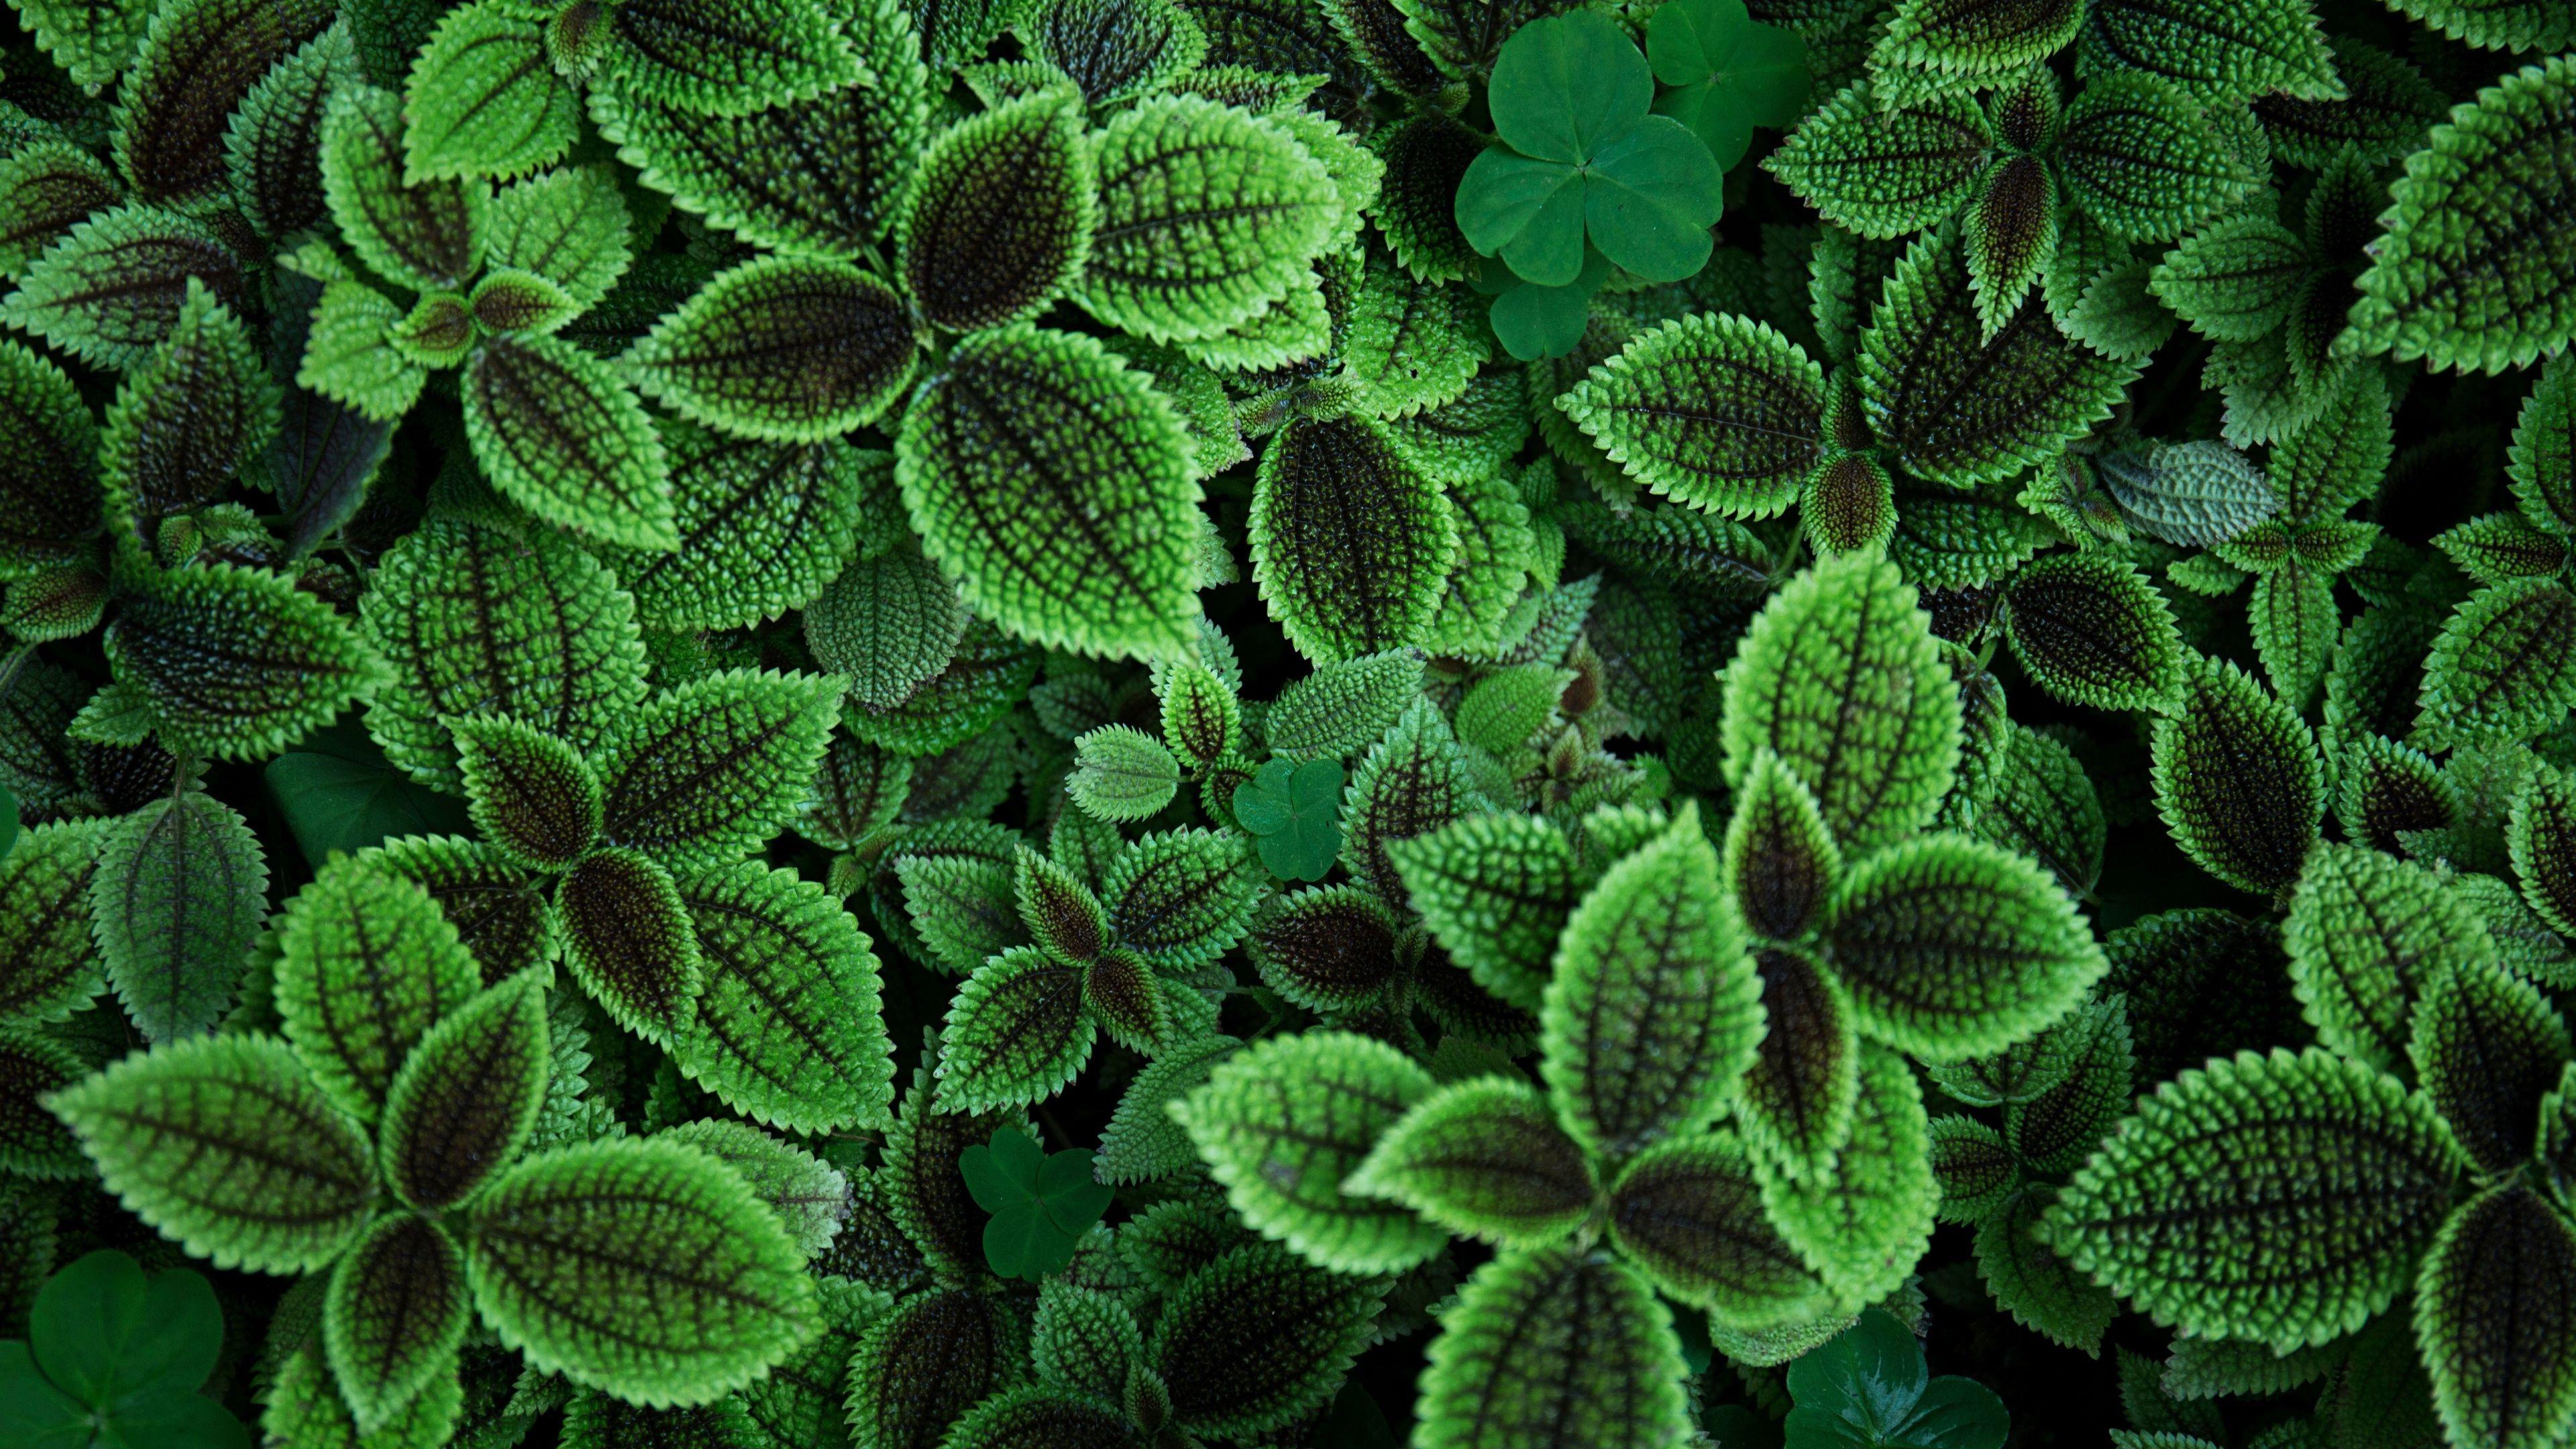 3840x2160 Leaves 4k Full Hd Wallpaper Perfect Plants Plants Green Living Tips